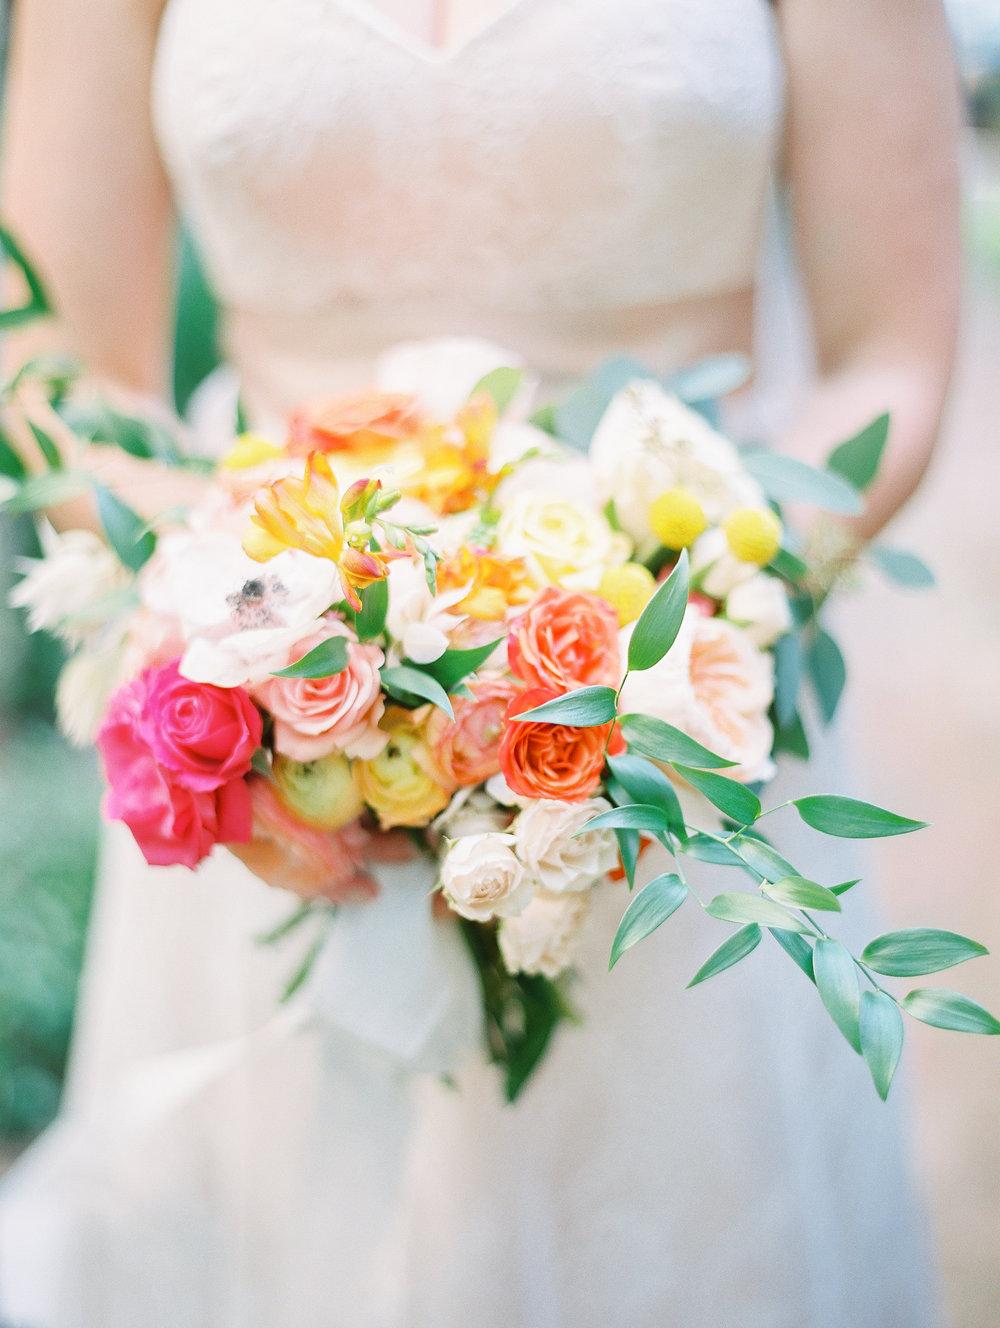 i'on meeting house popup summer wedding in charleston - elopement planners scarlet plan & design (131).jpg